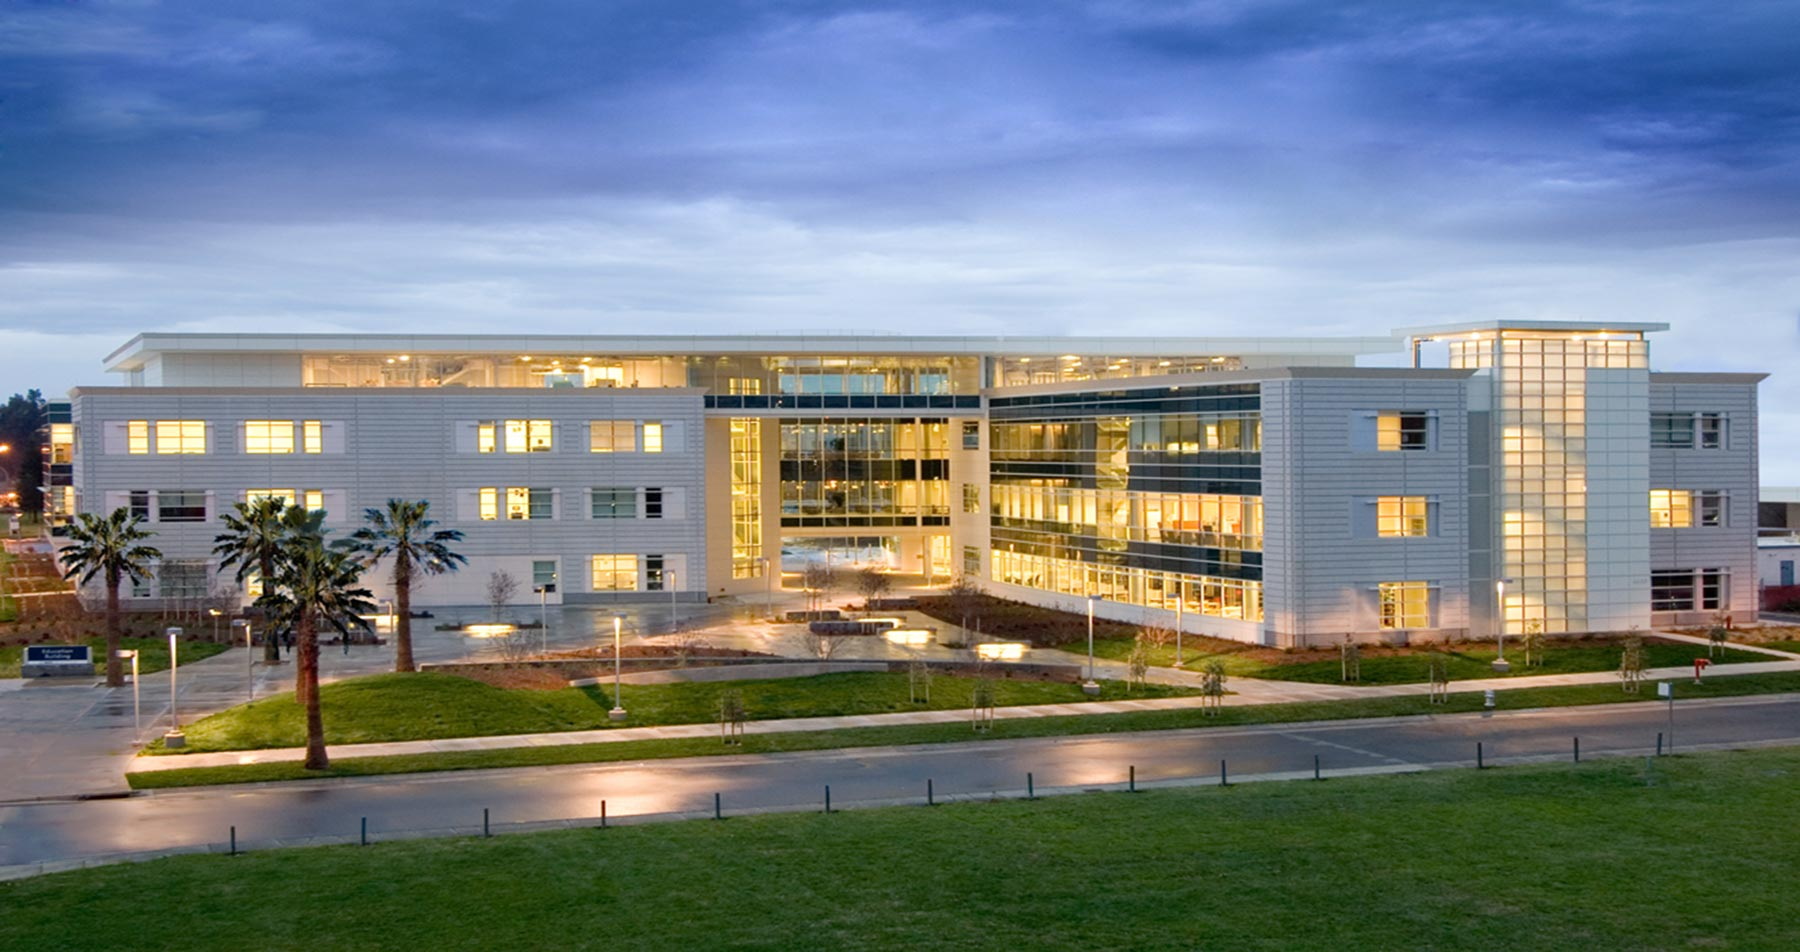 University of California at Davis, Medical Center Campus